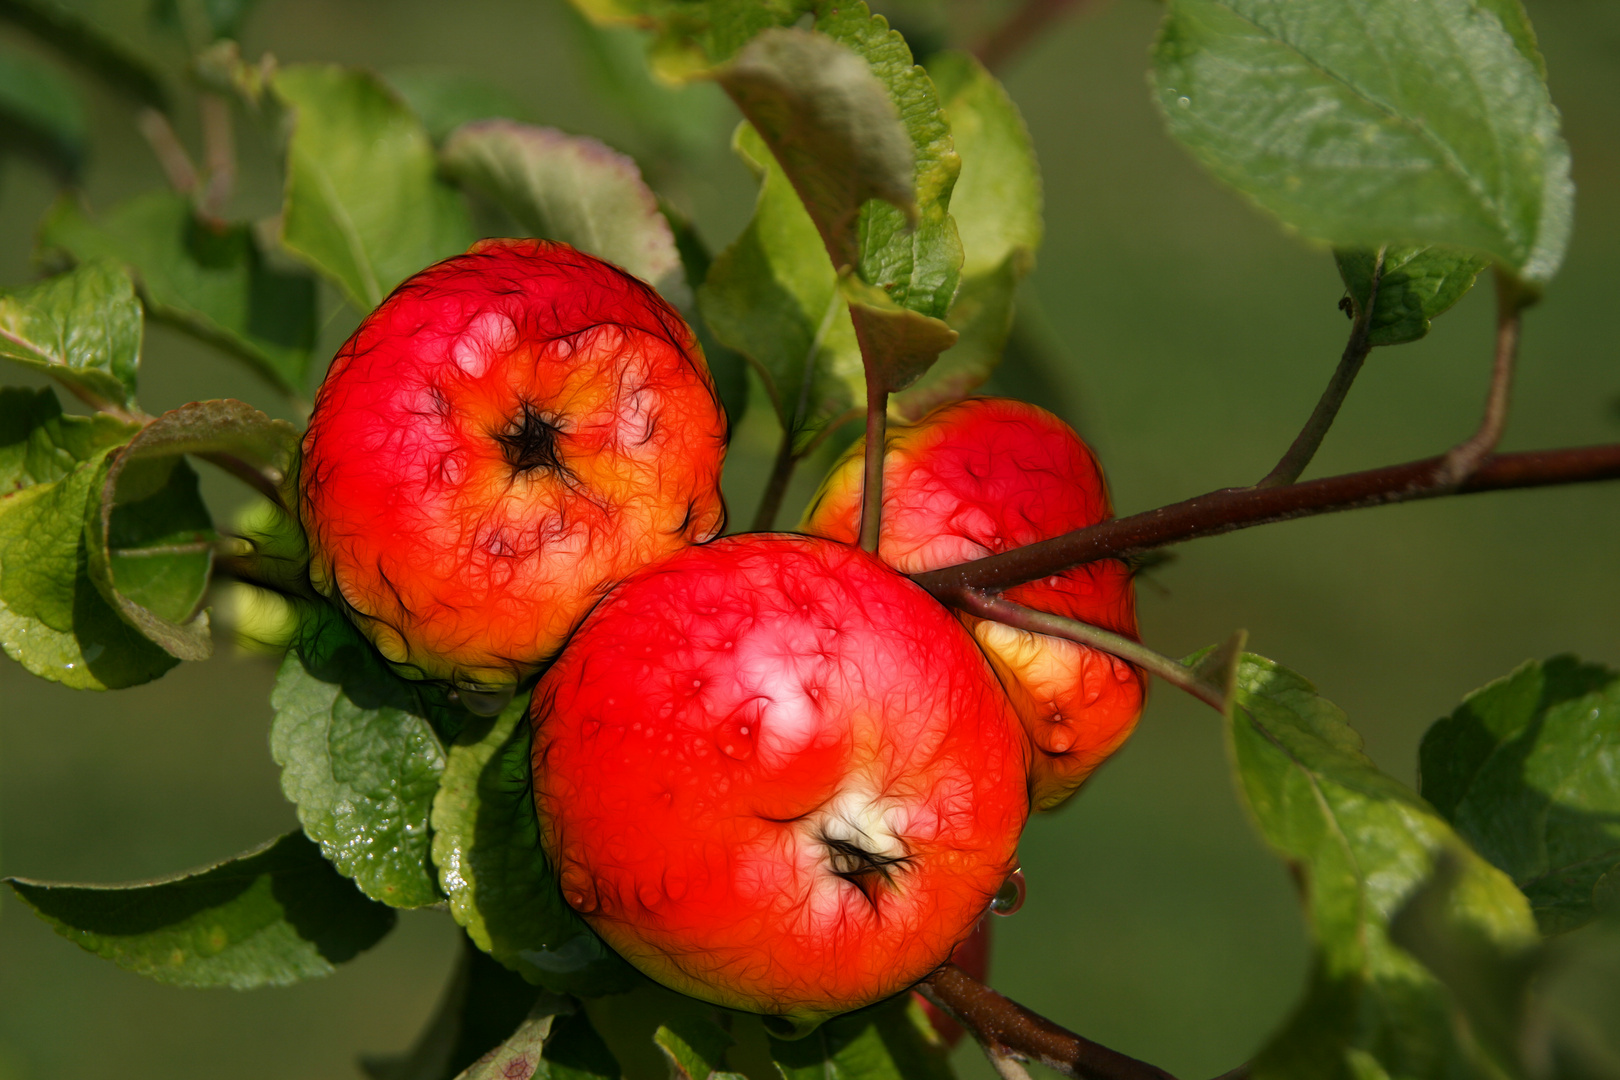 Äpfel - wie gemalt